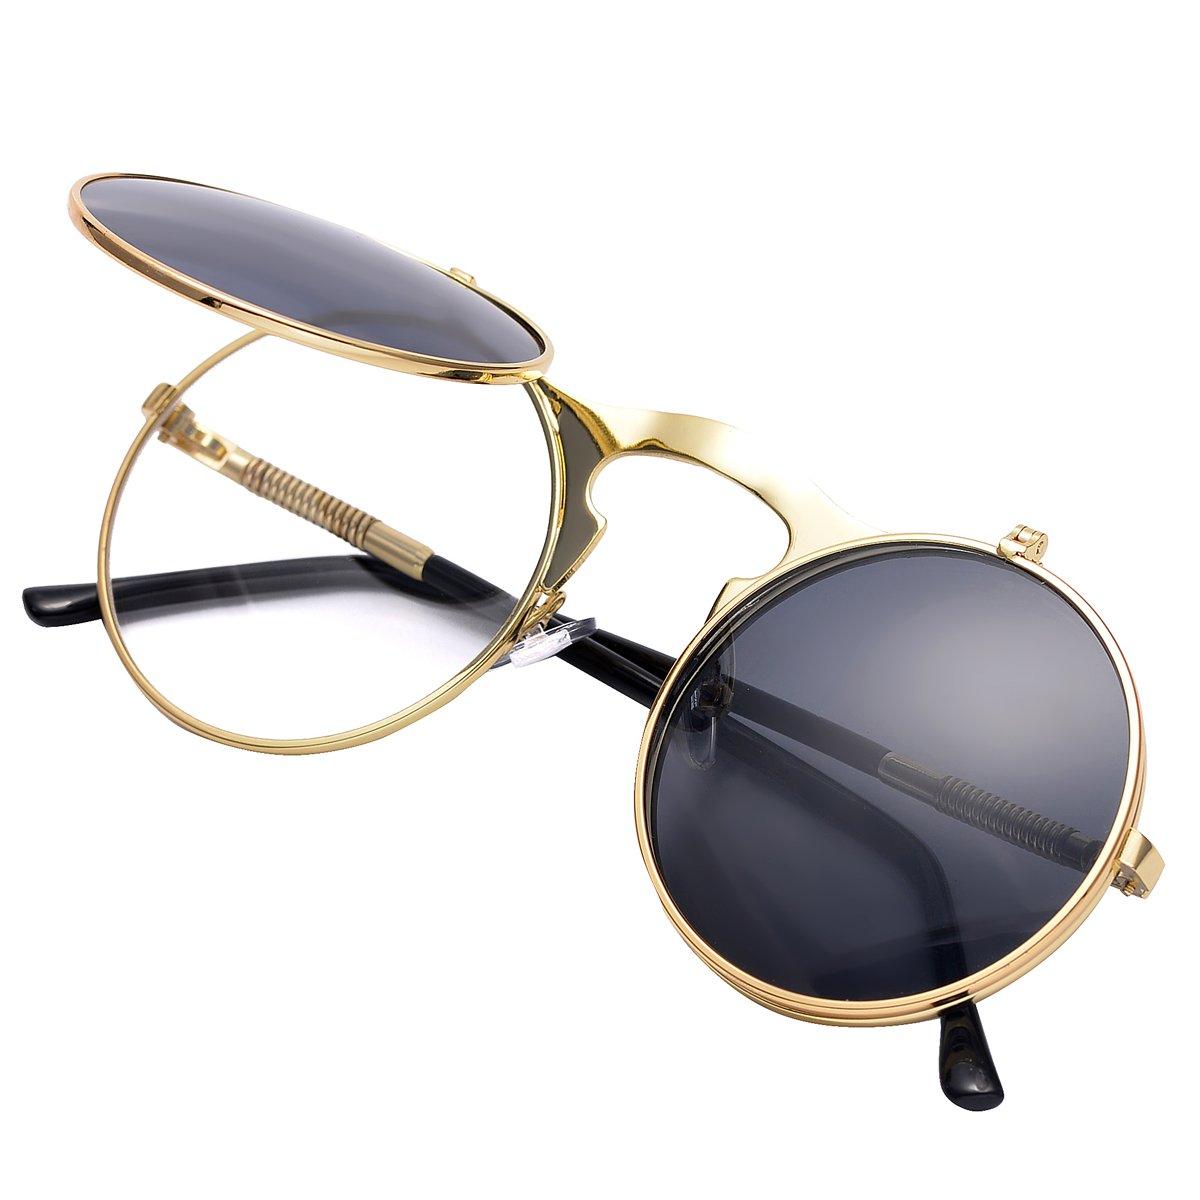 1f25767bf2 Amazon.com  COASION Vintage Round Flip Up Sunglasses for Men Women Juniors  John Lennon Style Circle Sun Glasses(Gold Frame Black Lens)  Shoes